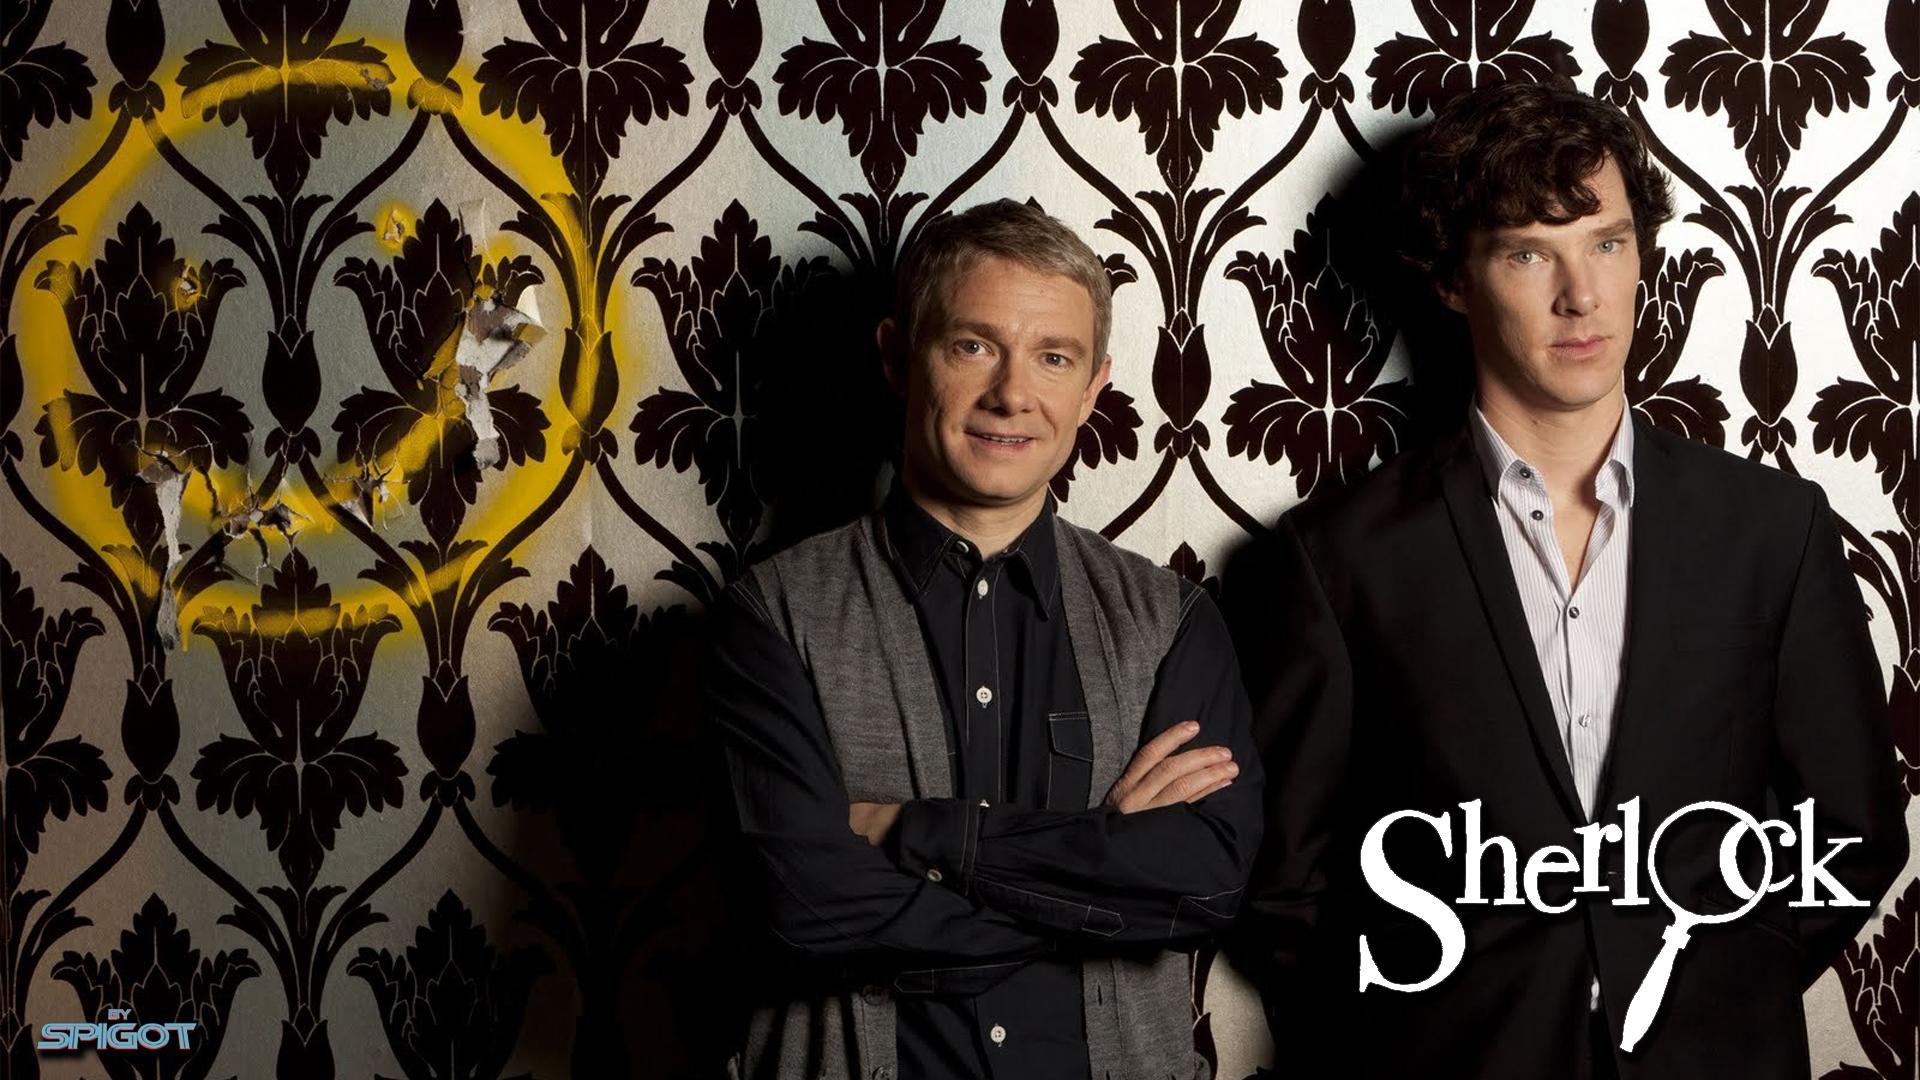 Stenciling-Sherlock-wallpaper-wpc5809053